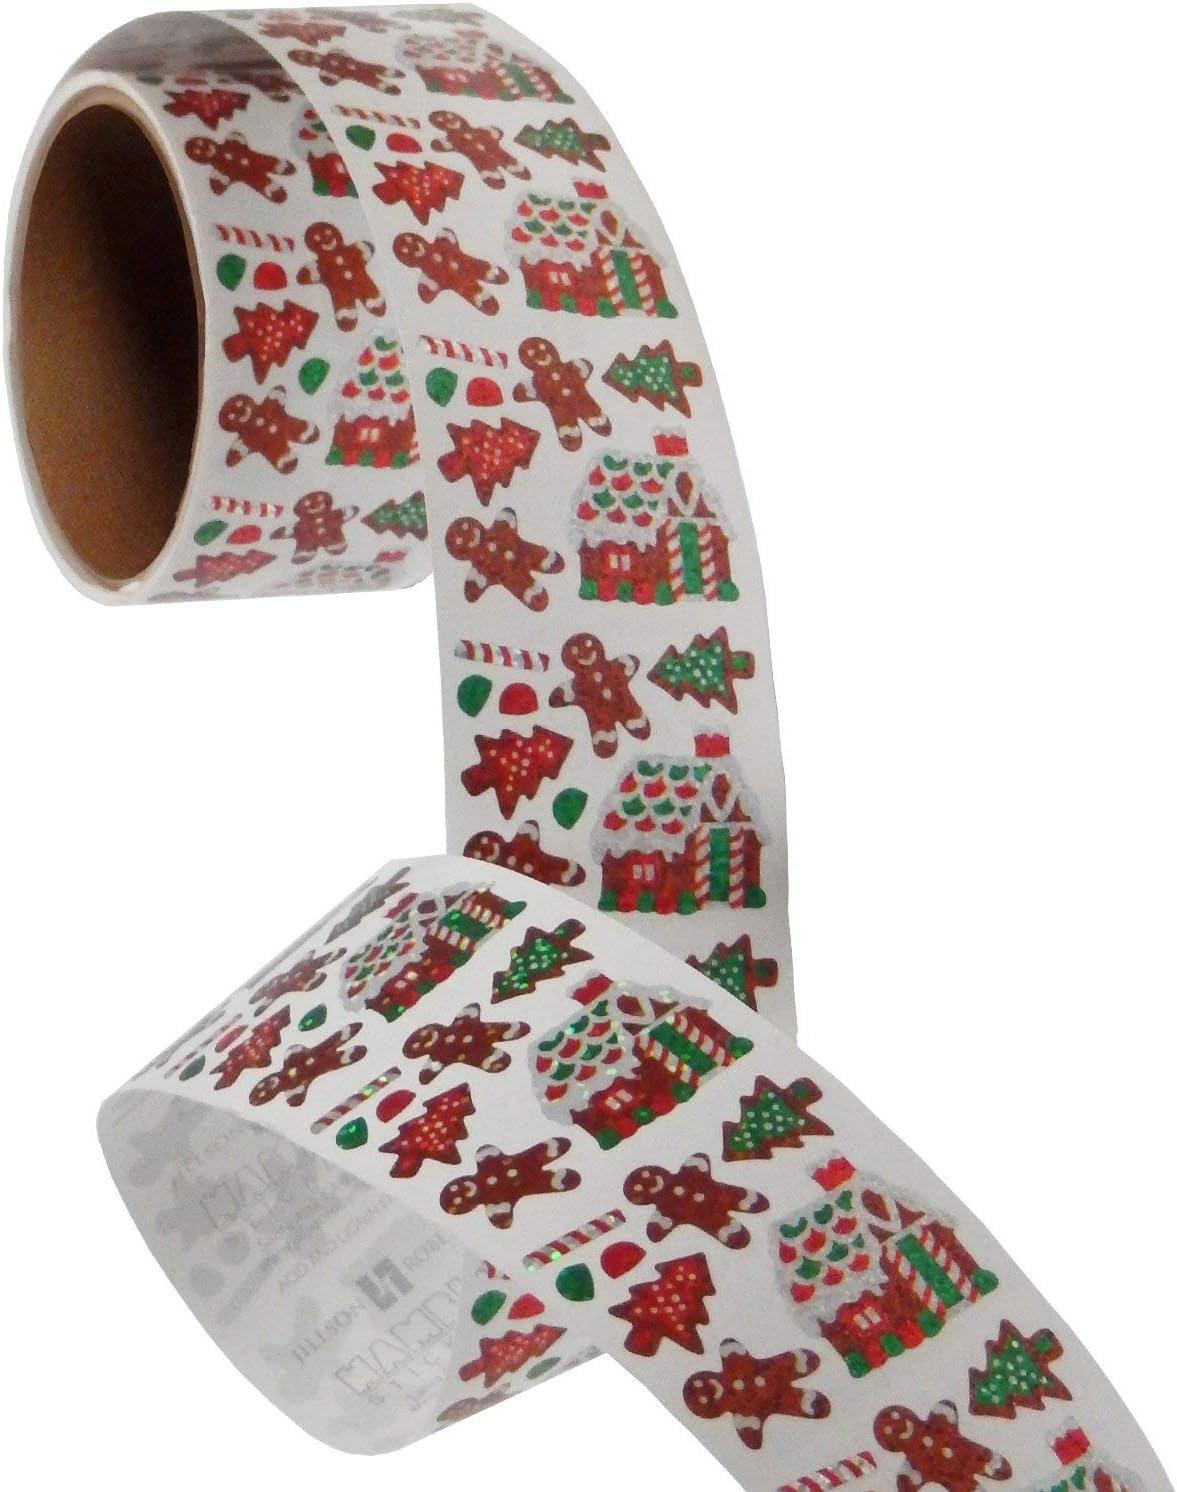 Jillson & Roberts Bulk Rol Stickers, Mini Gingerbread House, Cookies - 100 Repeats